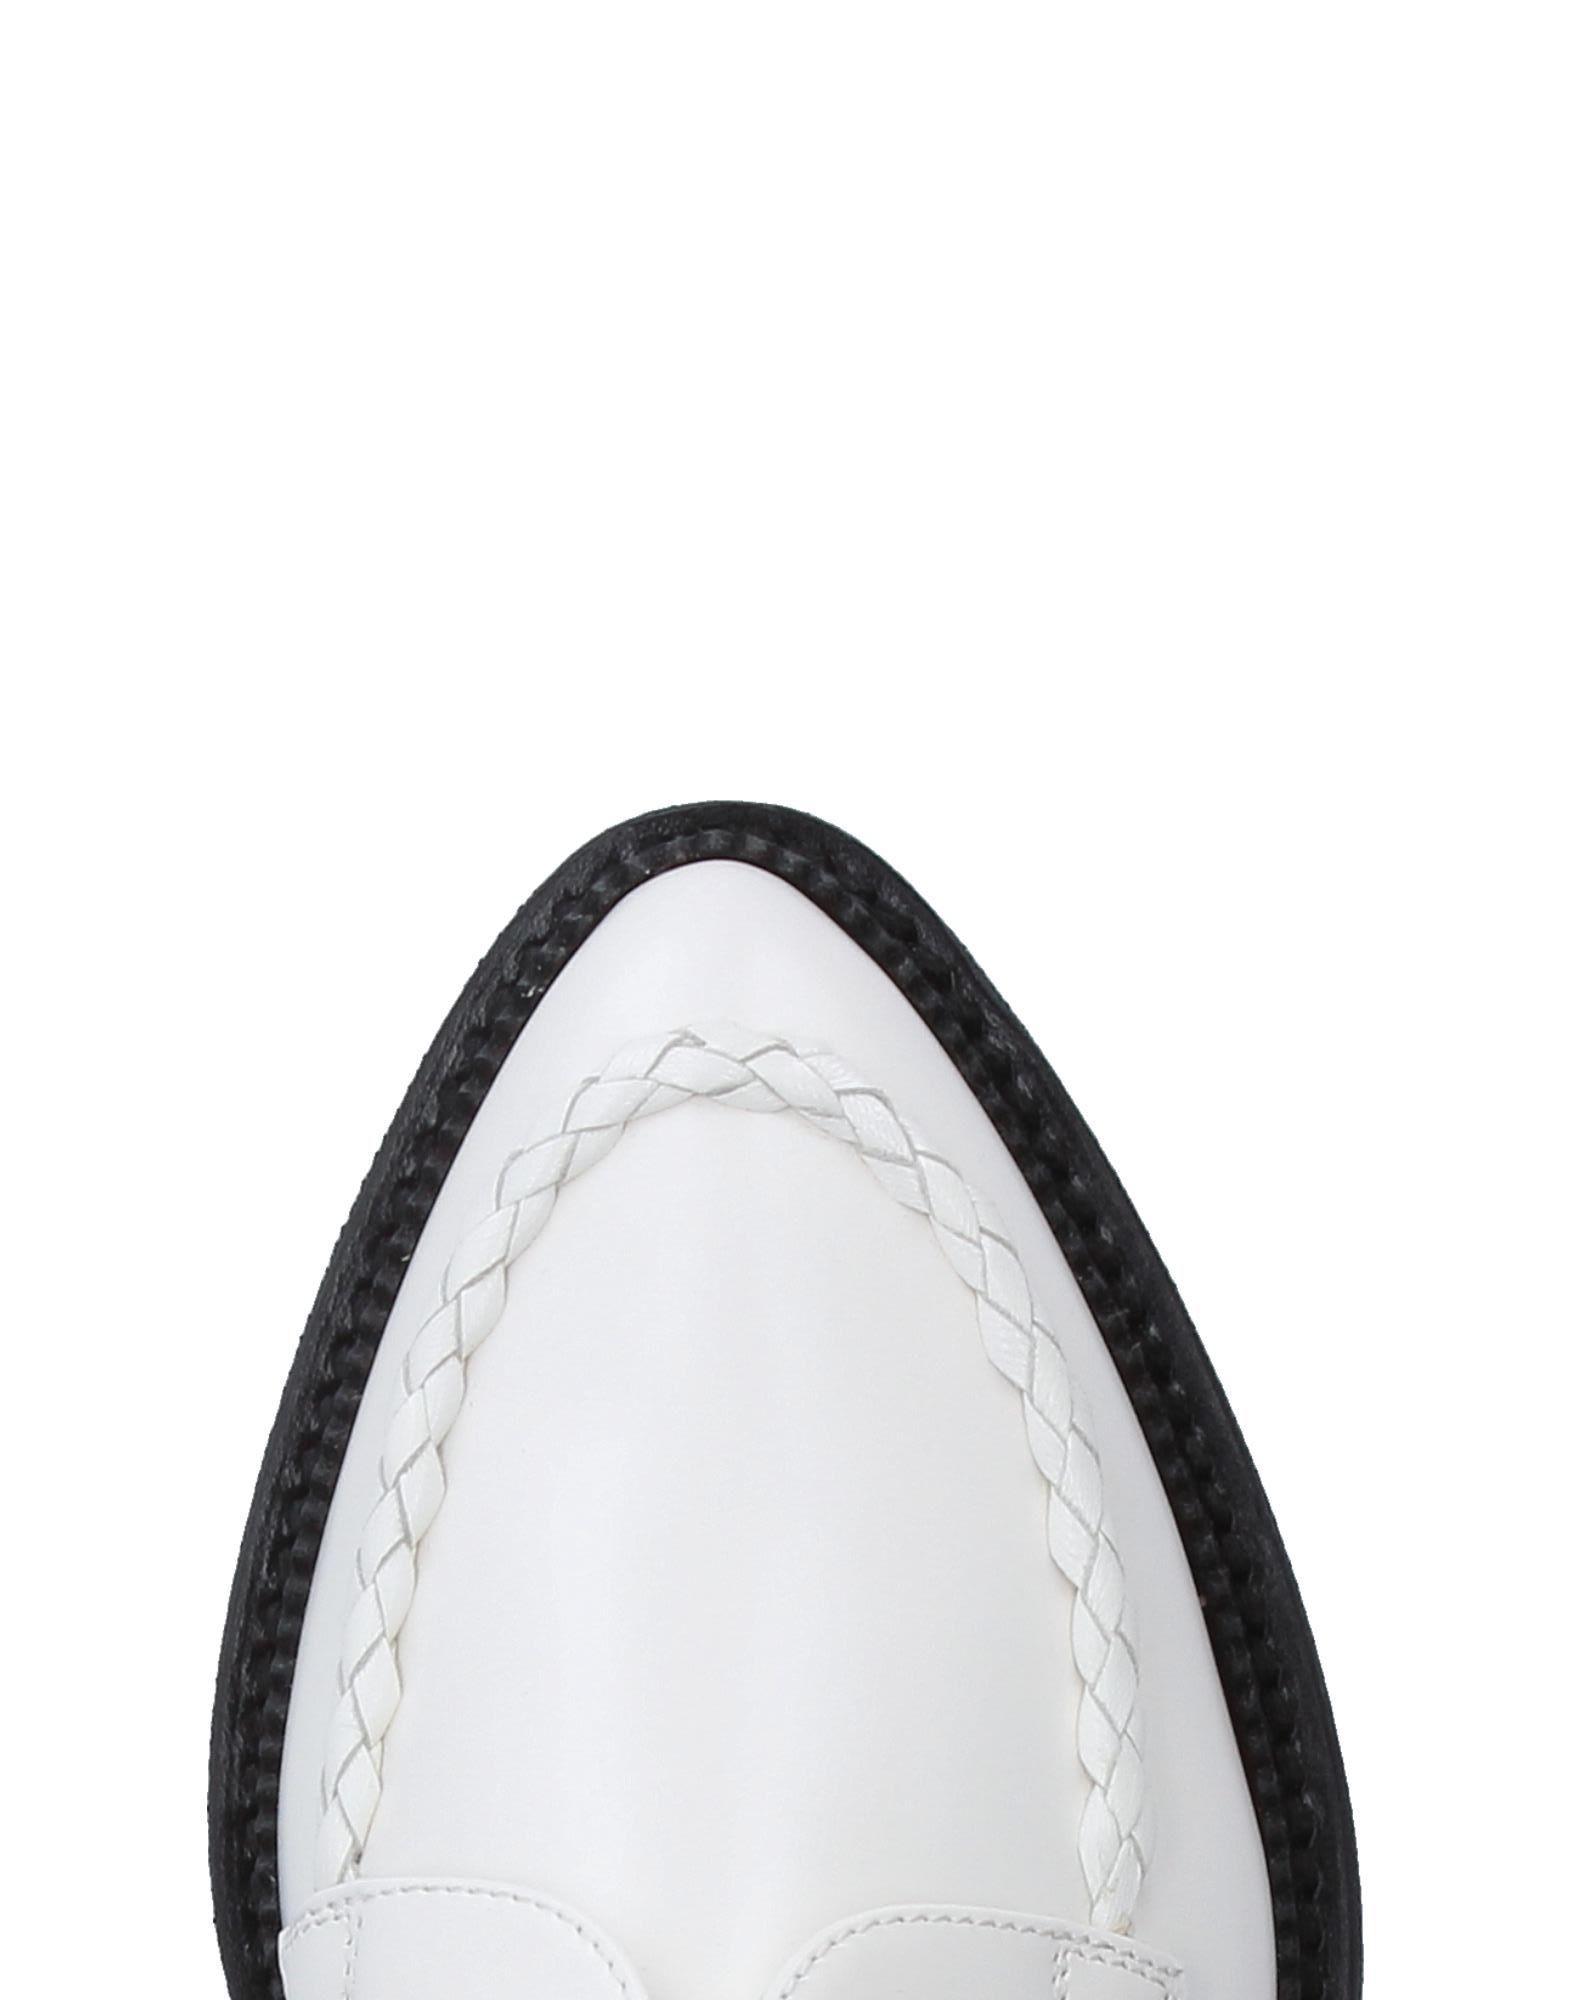 Chaussures À Lacets Alexander Mcqueen Femme - Chaussures À Lacets Alexander Mcqueen sur